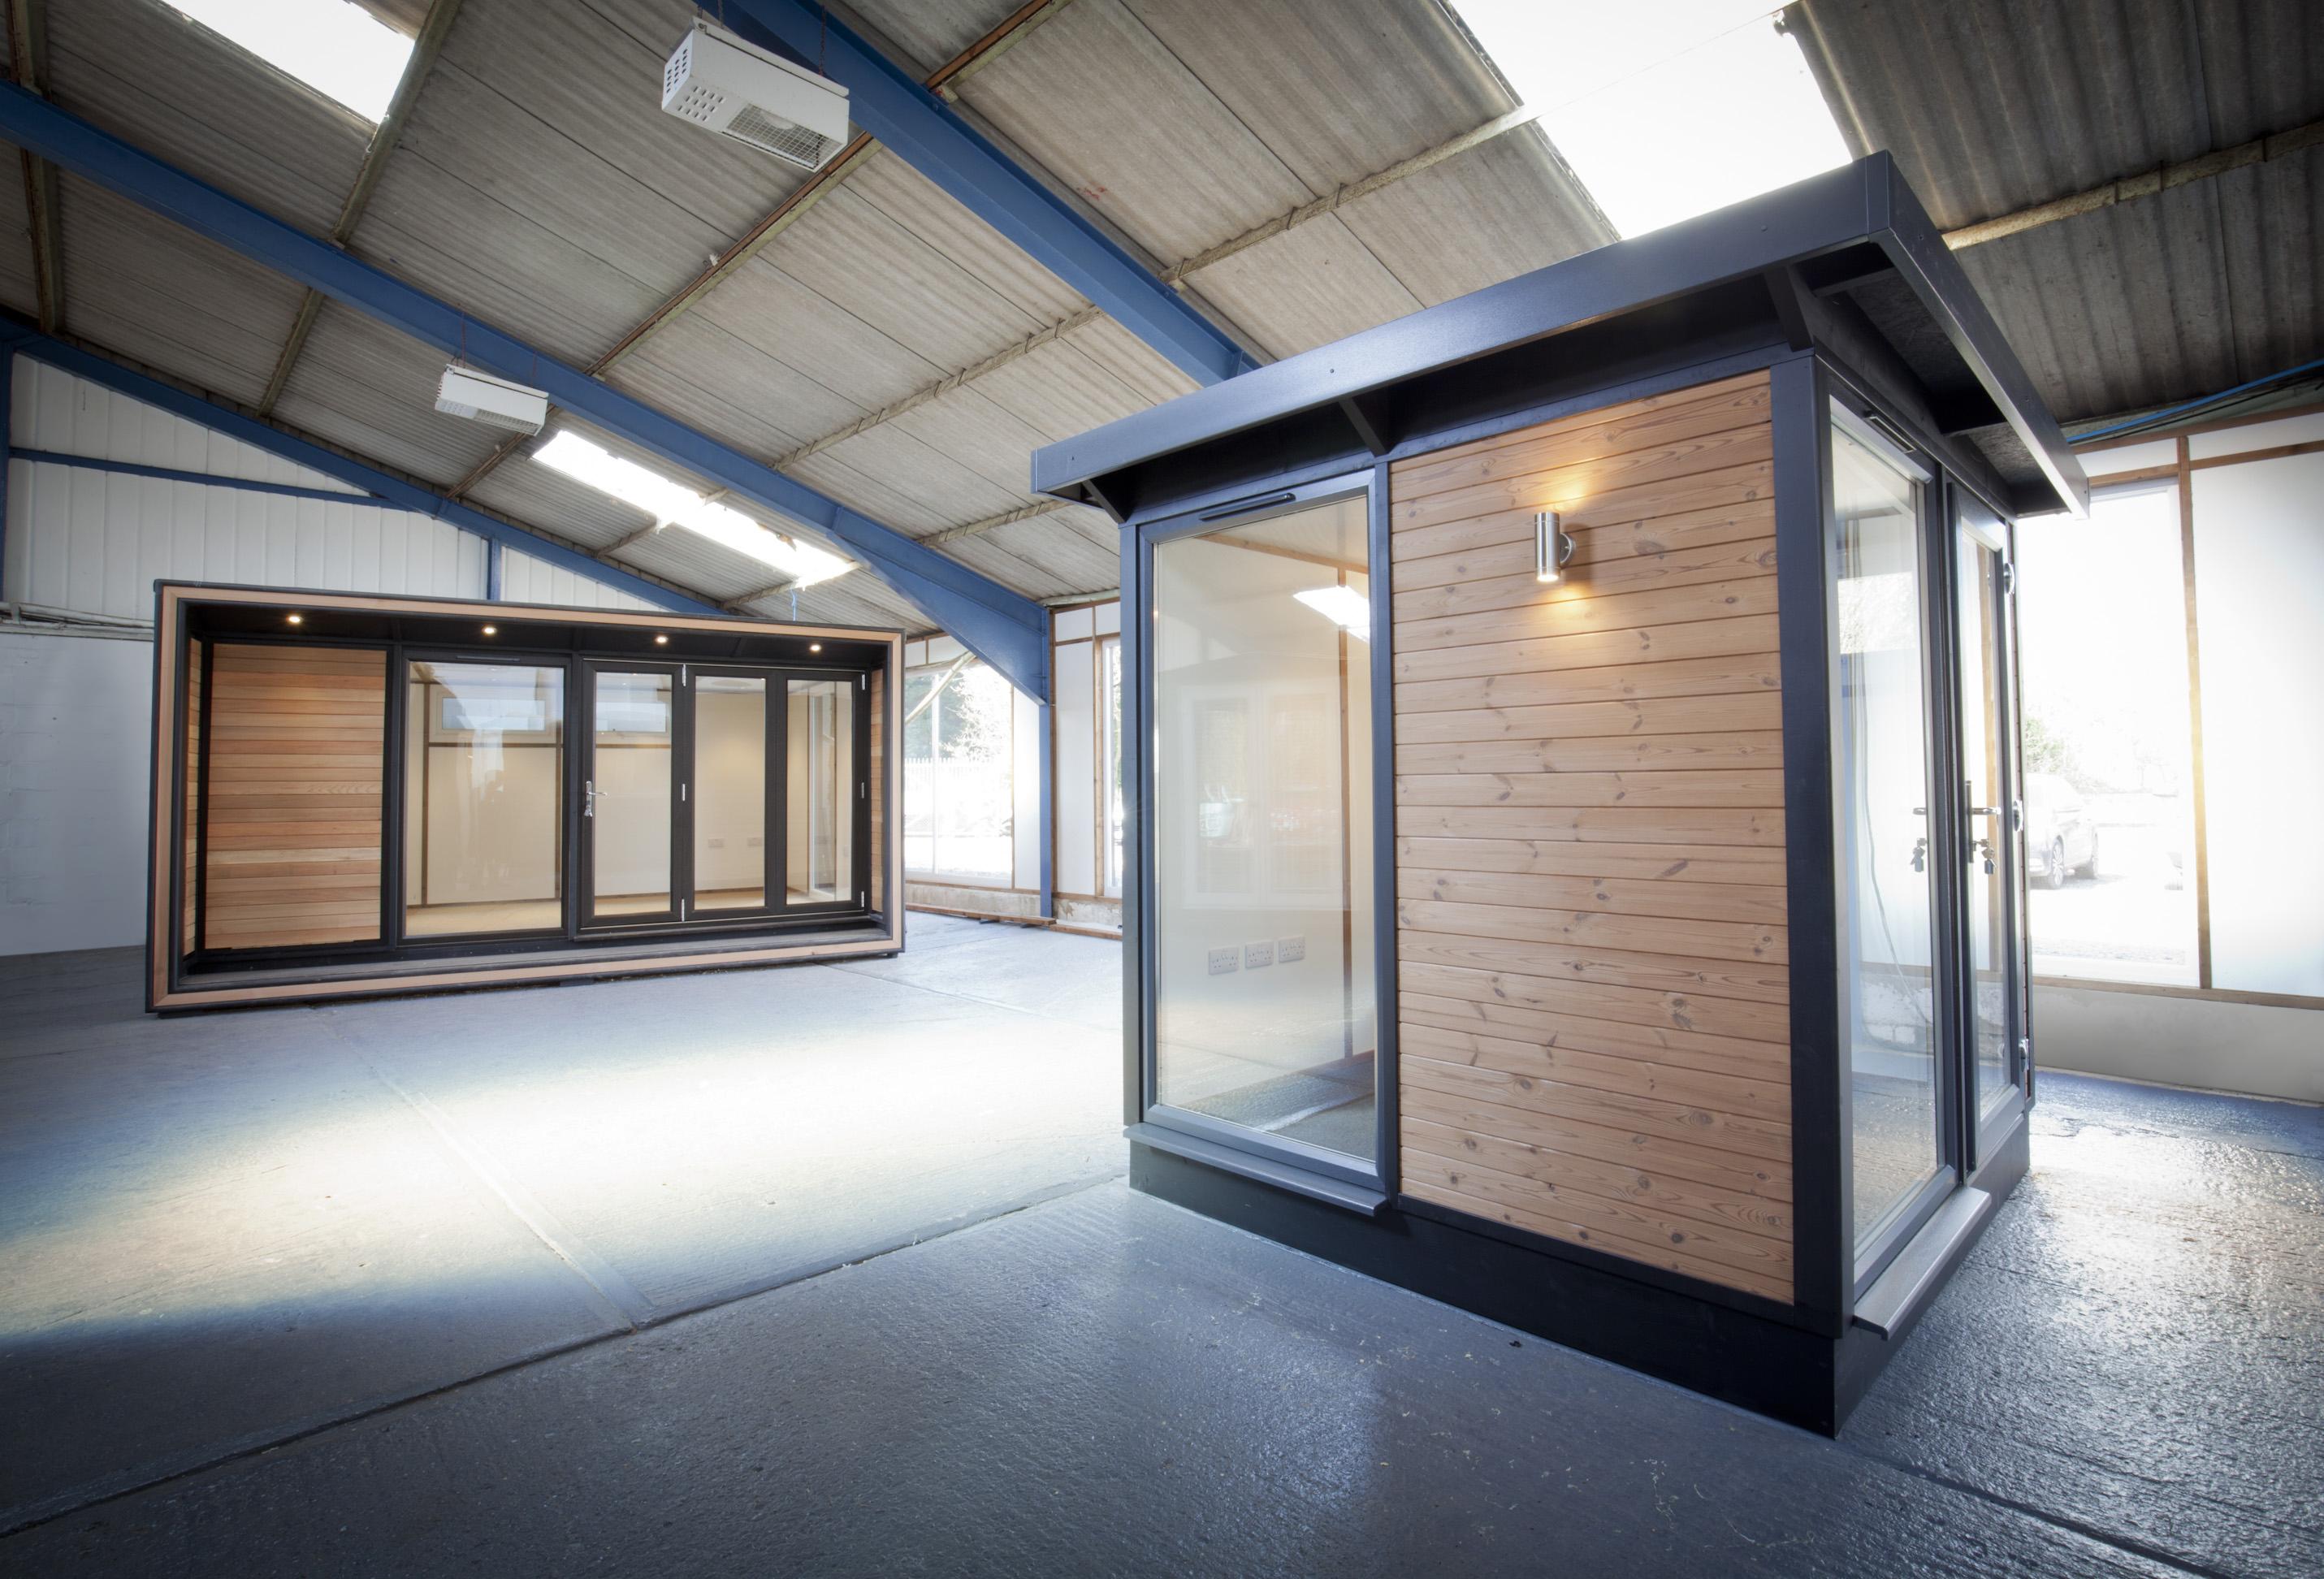 Key Studio at the Smart showroom